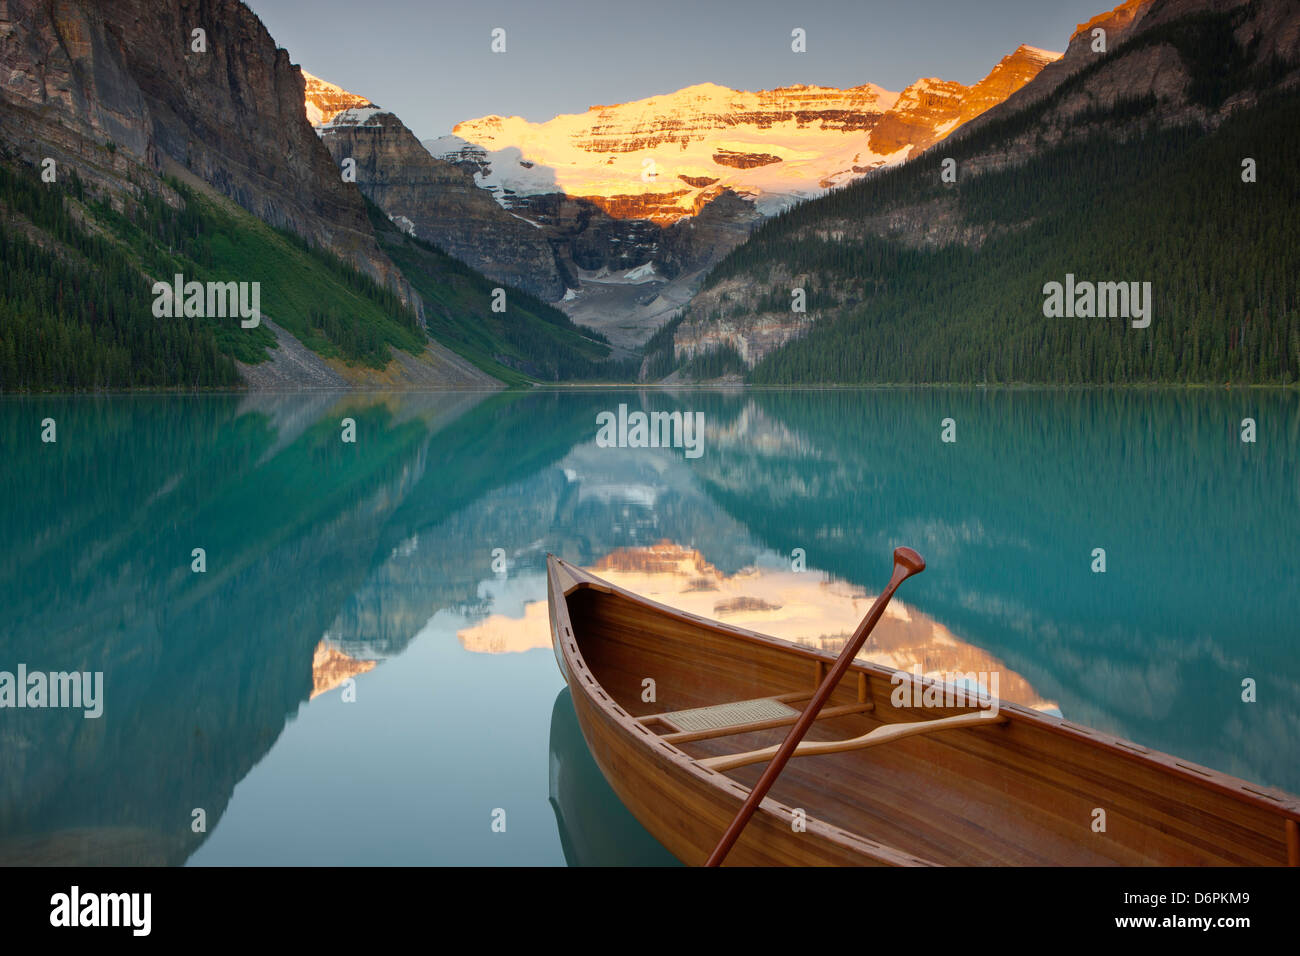 Canoe on Lake Louise at sunrise, Banff National Park, UNESCO World Heritage Site, Alberta, Rocky Mountains, Canada - Stock Image